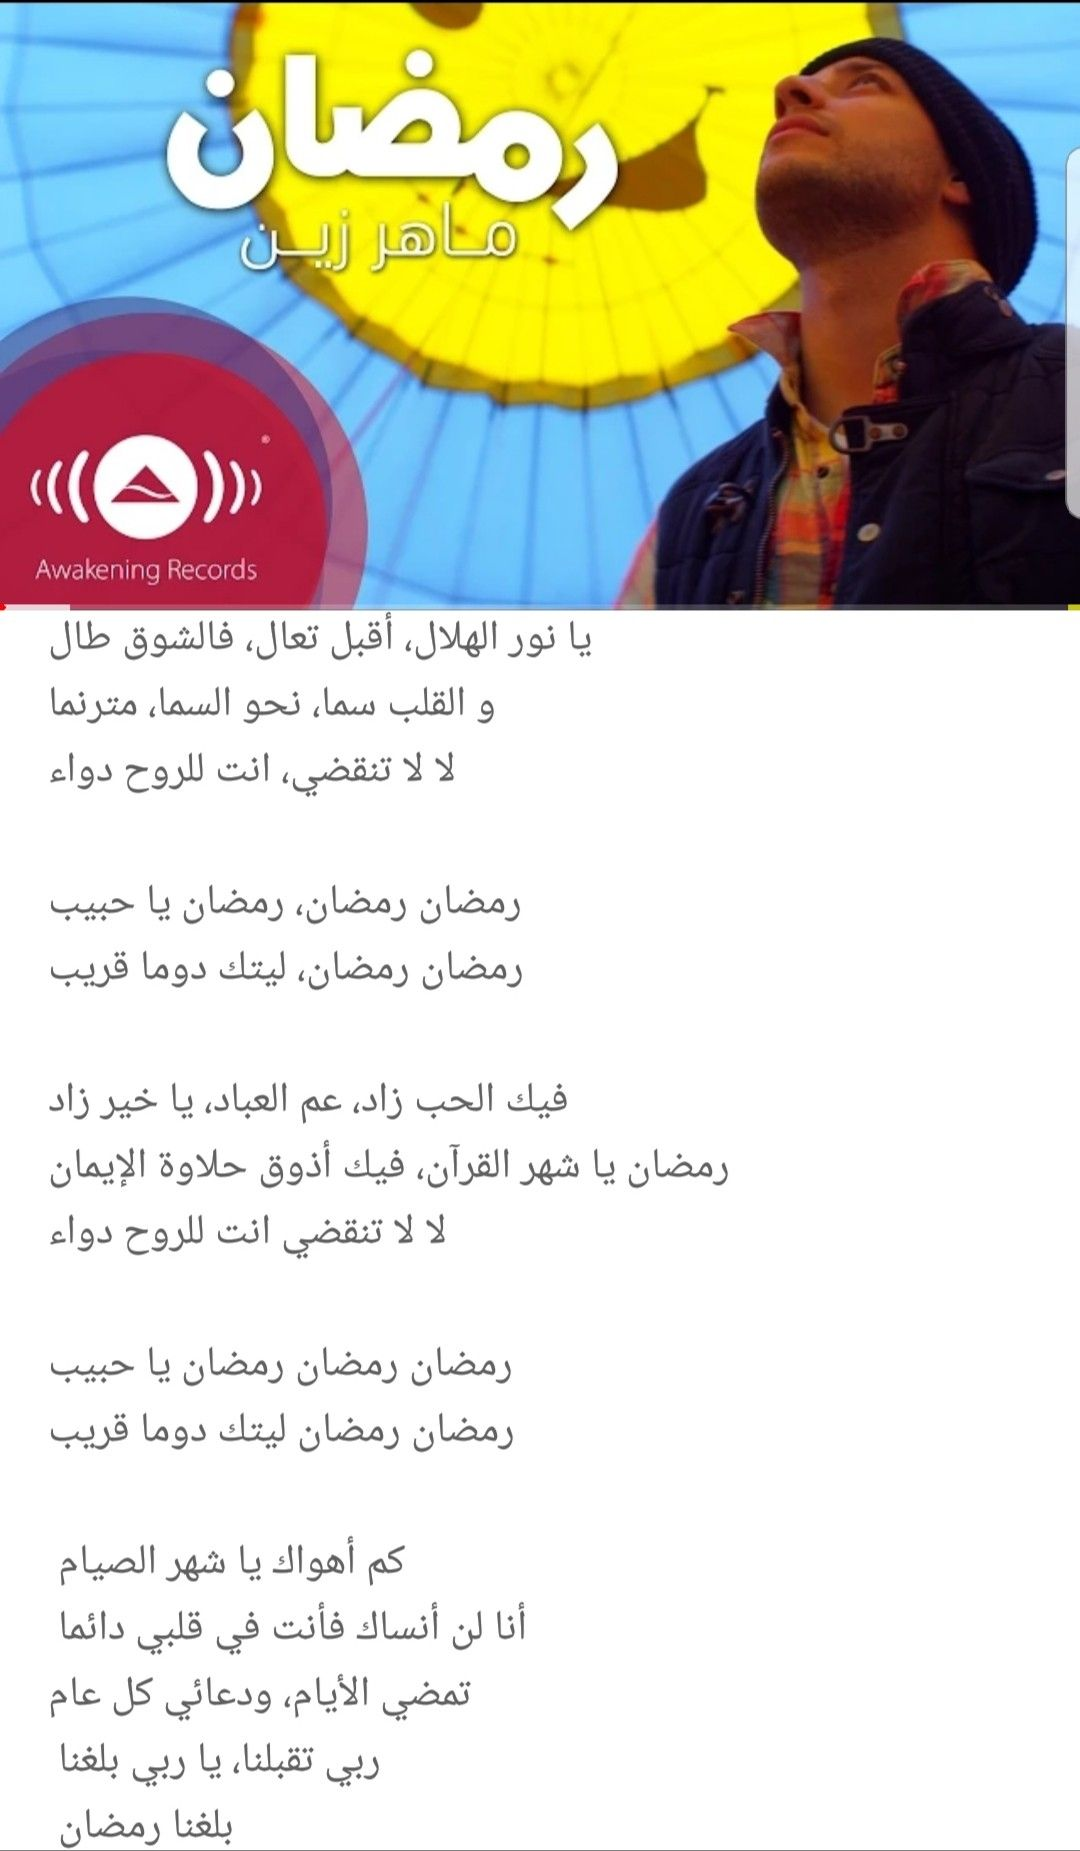 Ramadanu Ya Habeeb Maherzain Ahmed Maher Zain Awakening Movie Posters